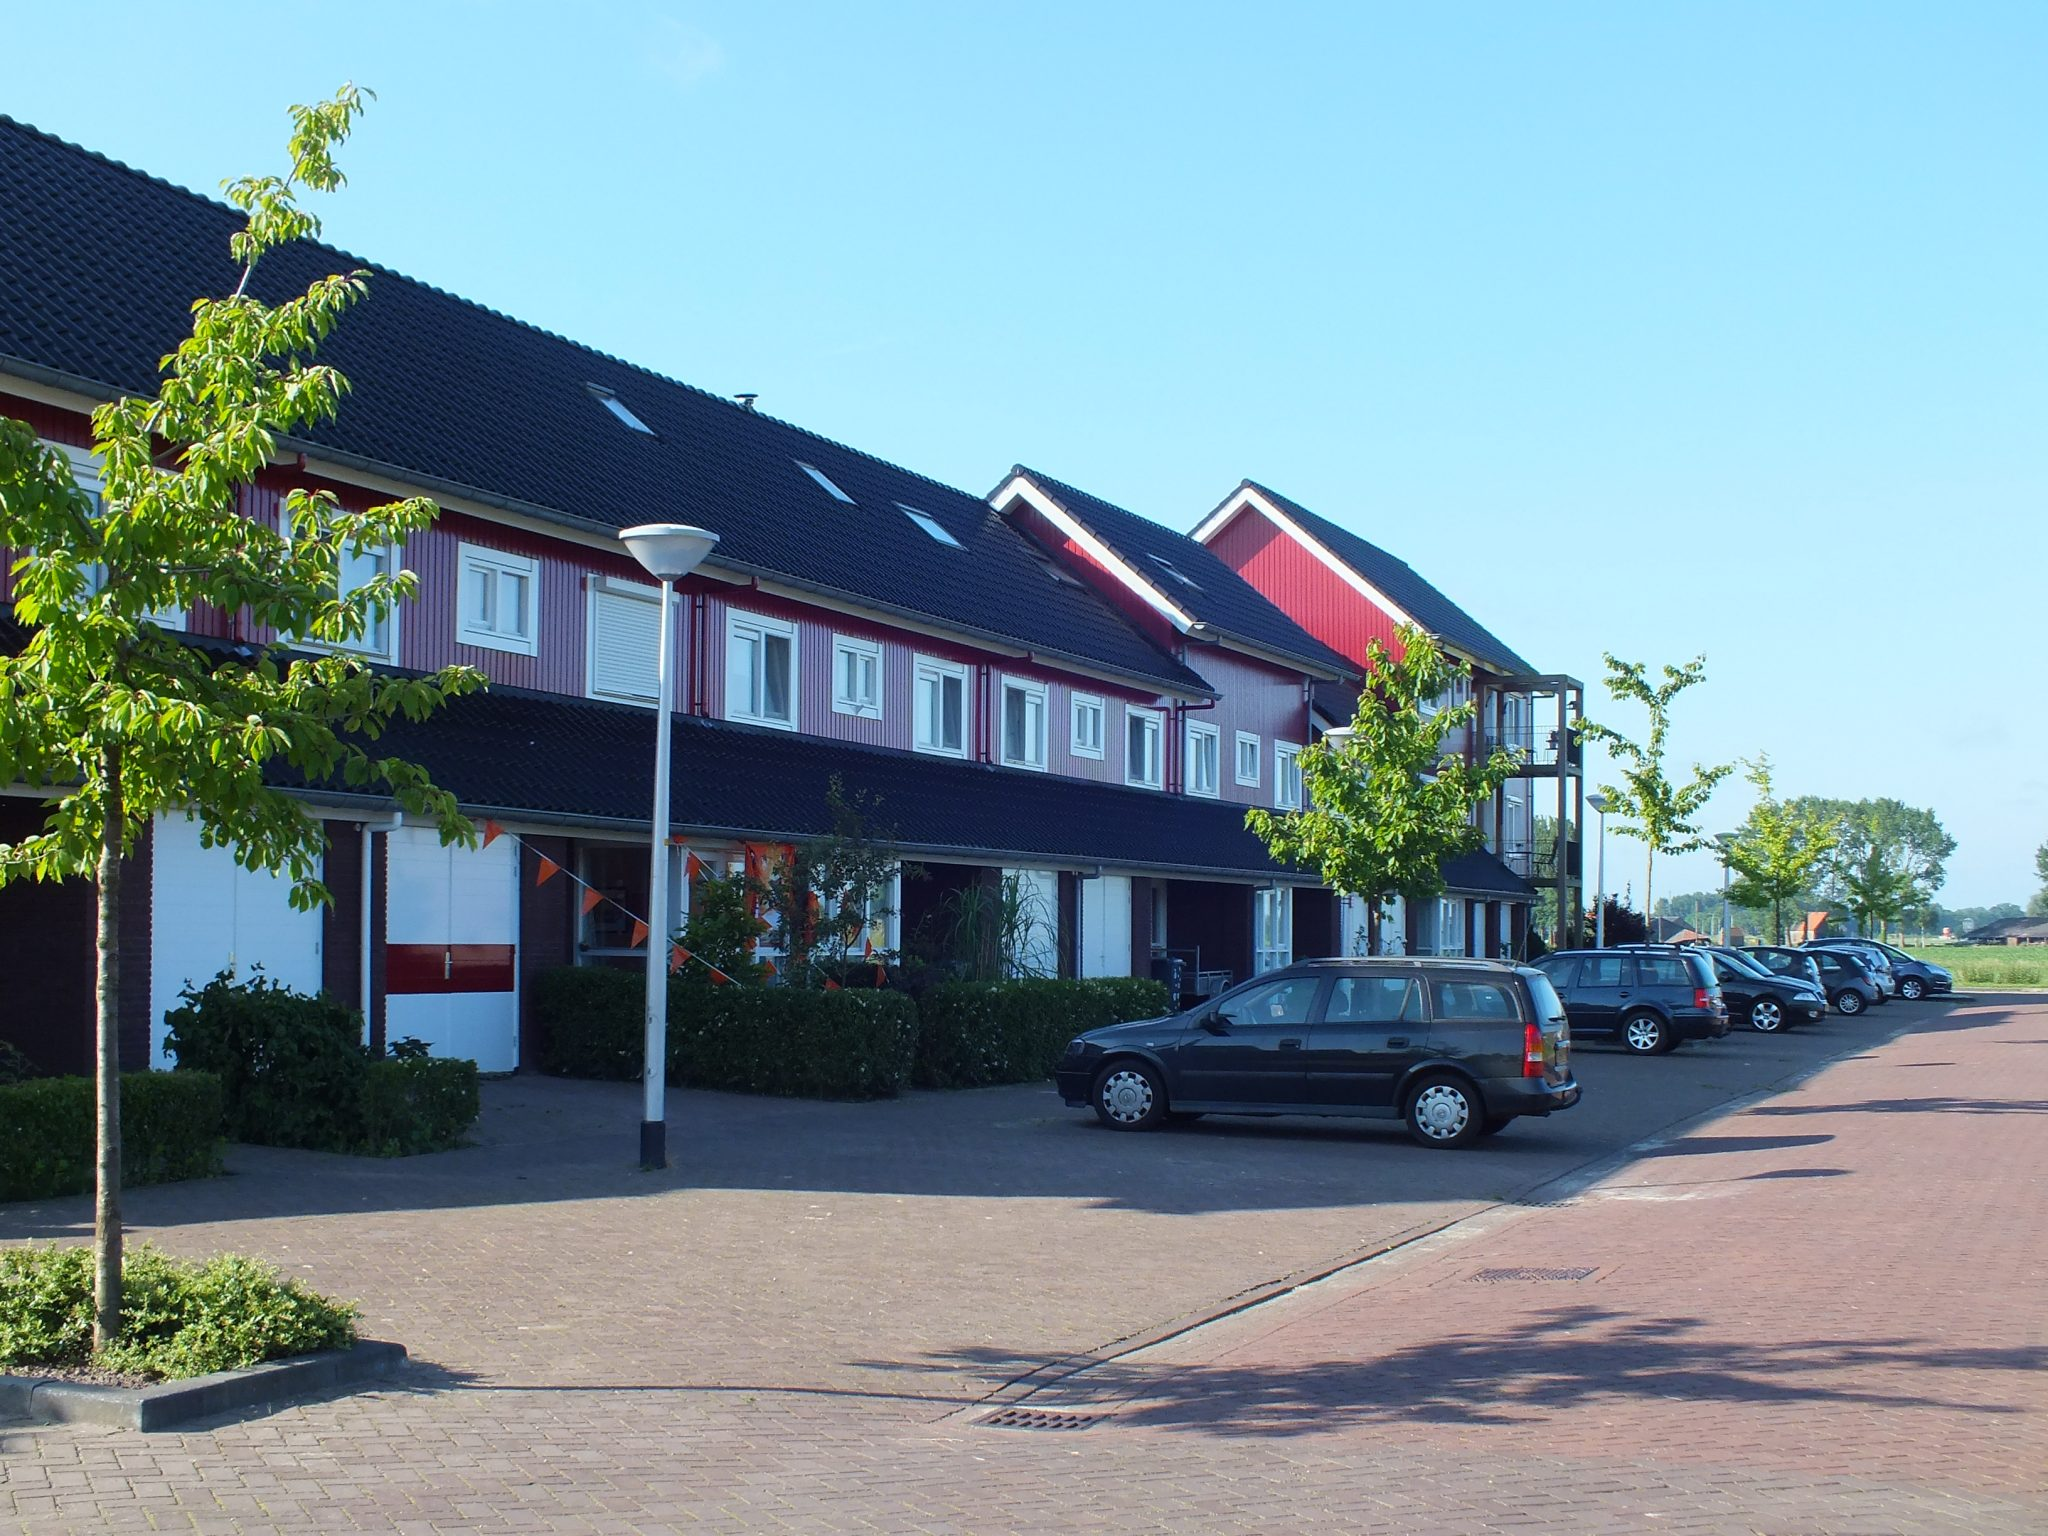 Duurzame woonwijk